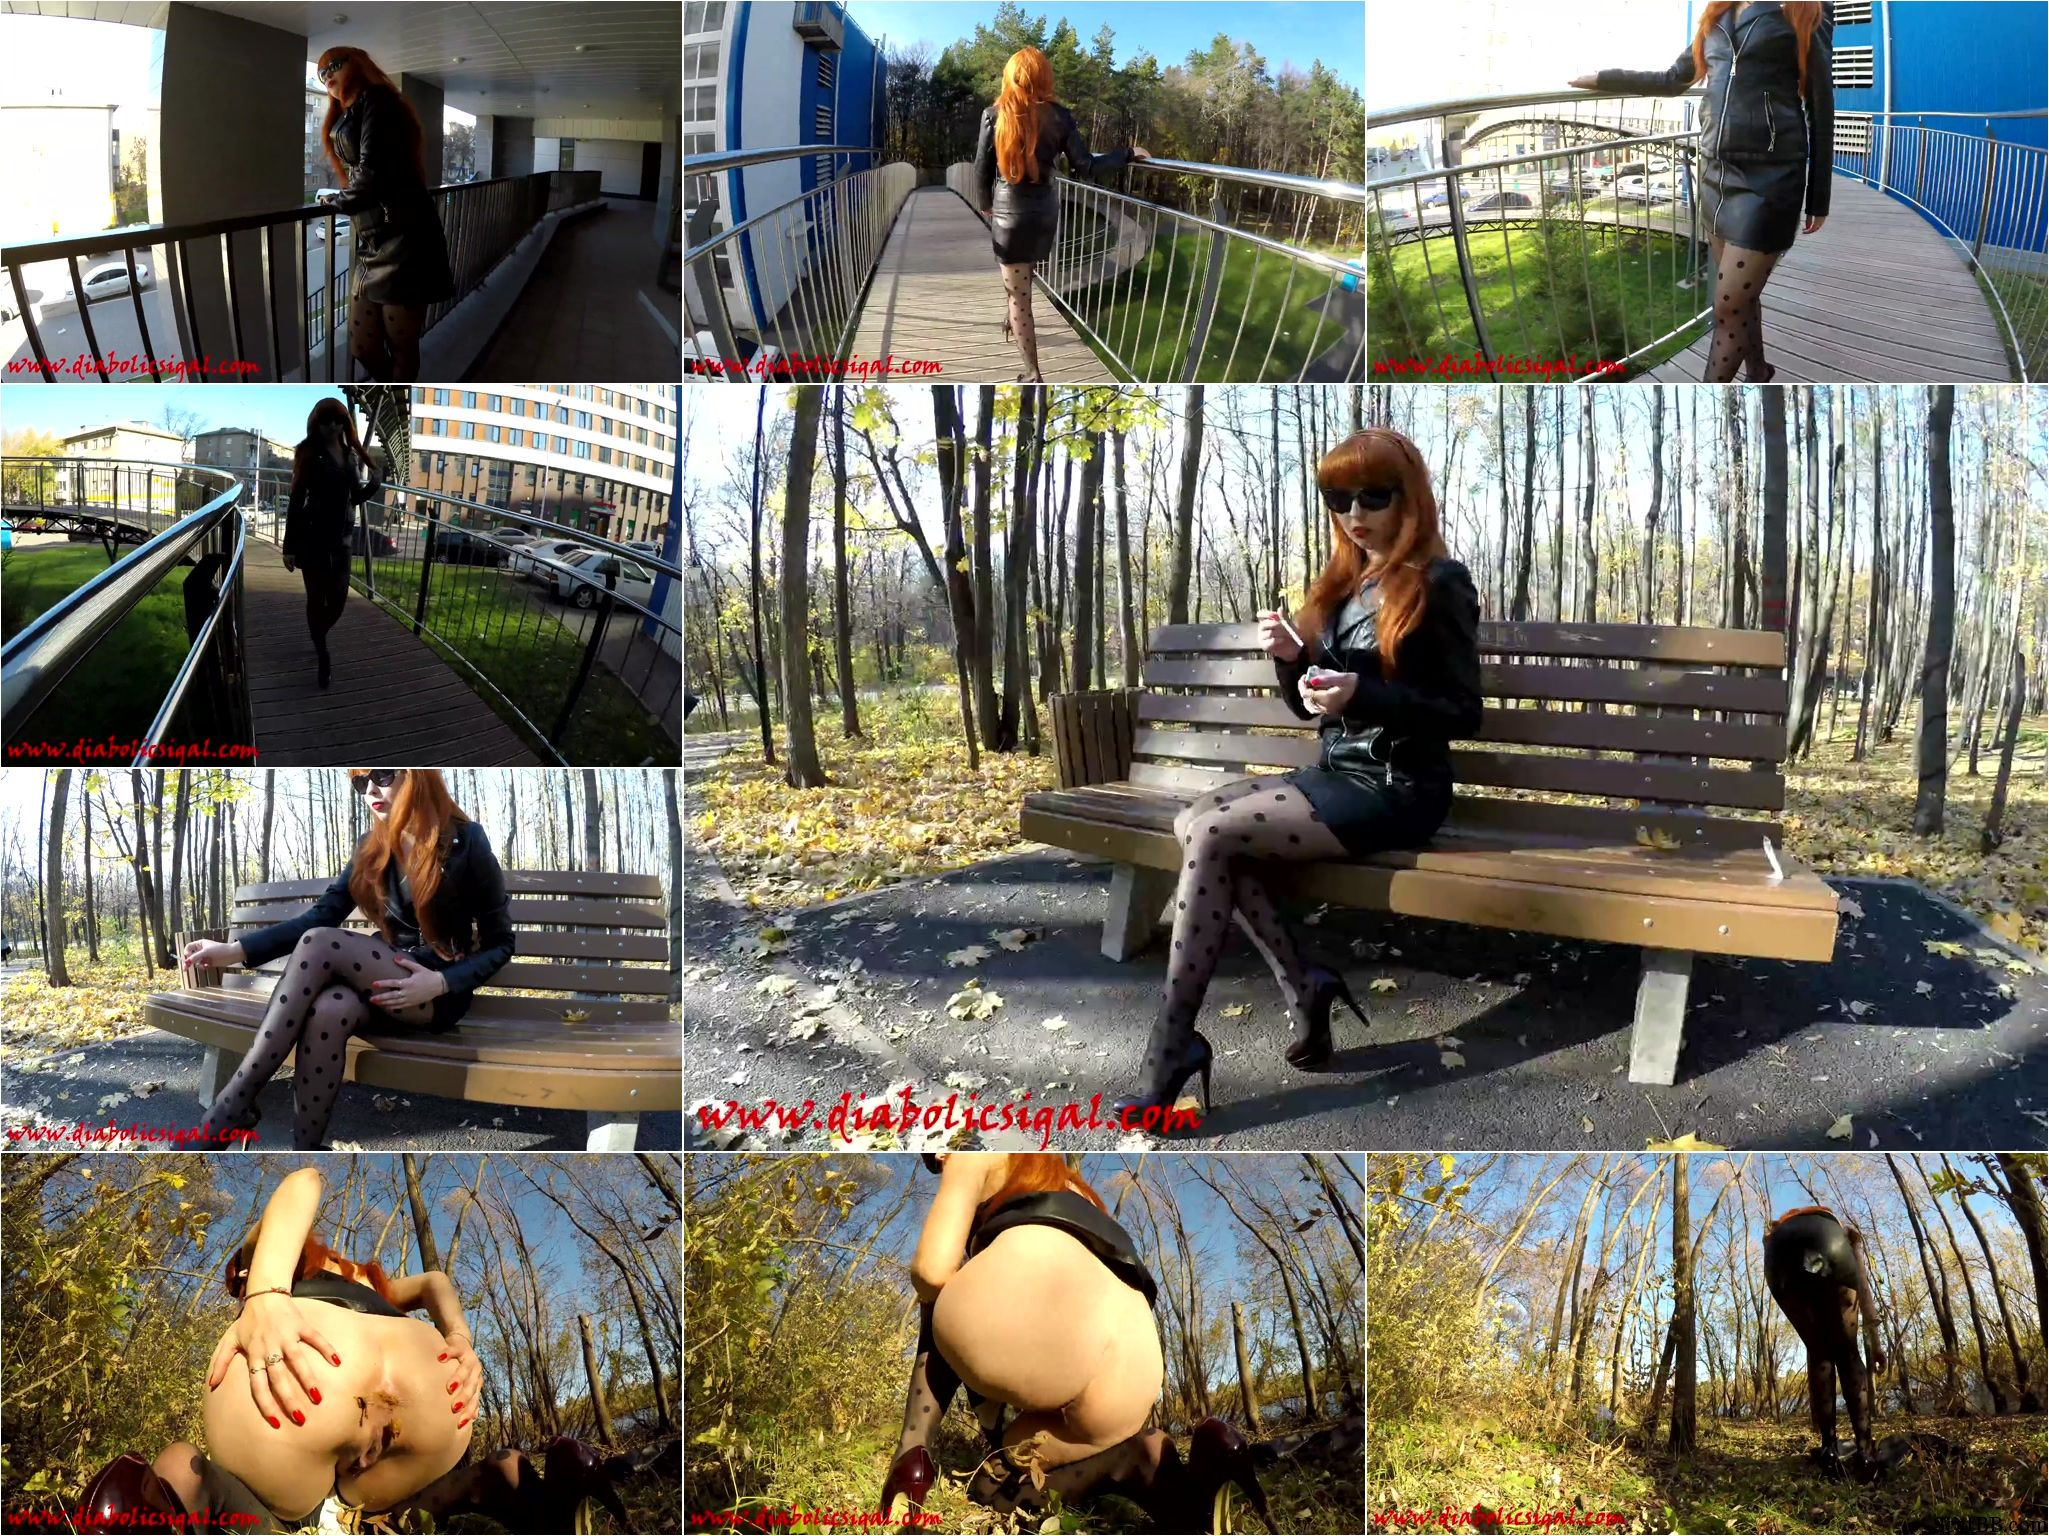 Mistress_Janet_-_Desperation_in_public_park.ScrinList.jpg